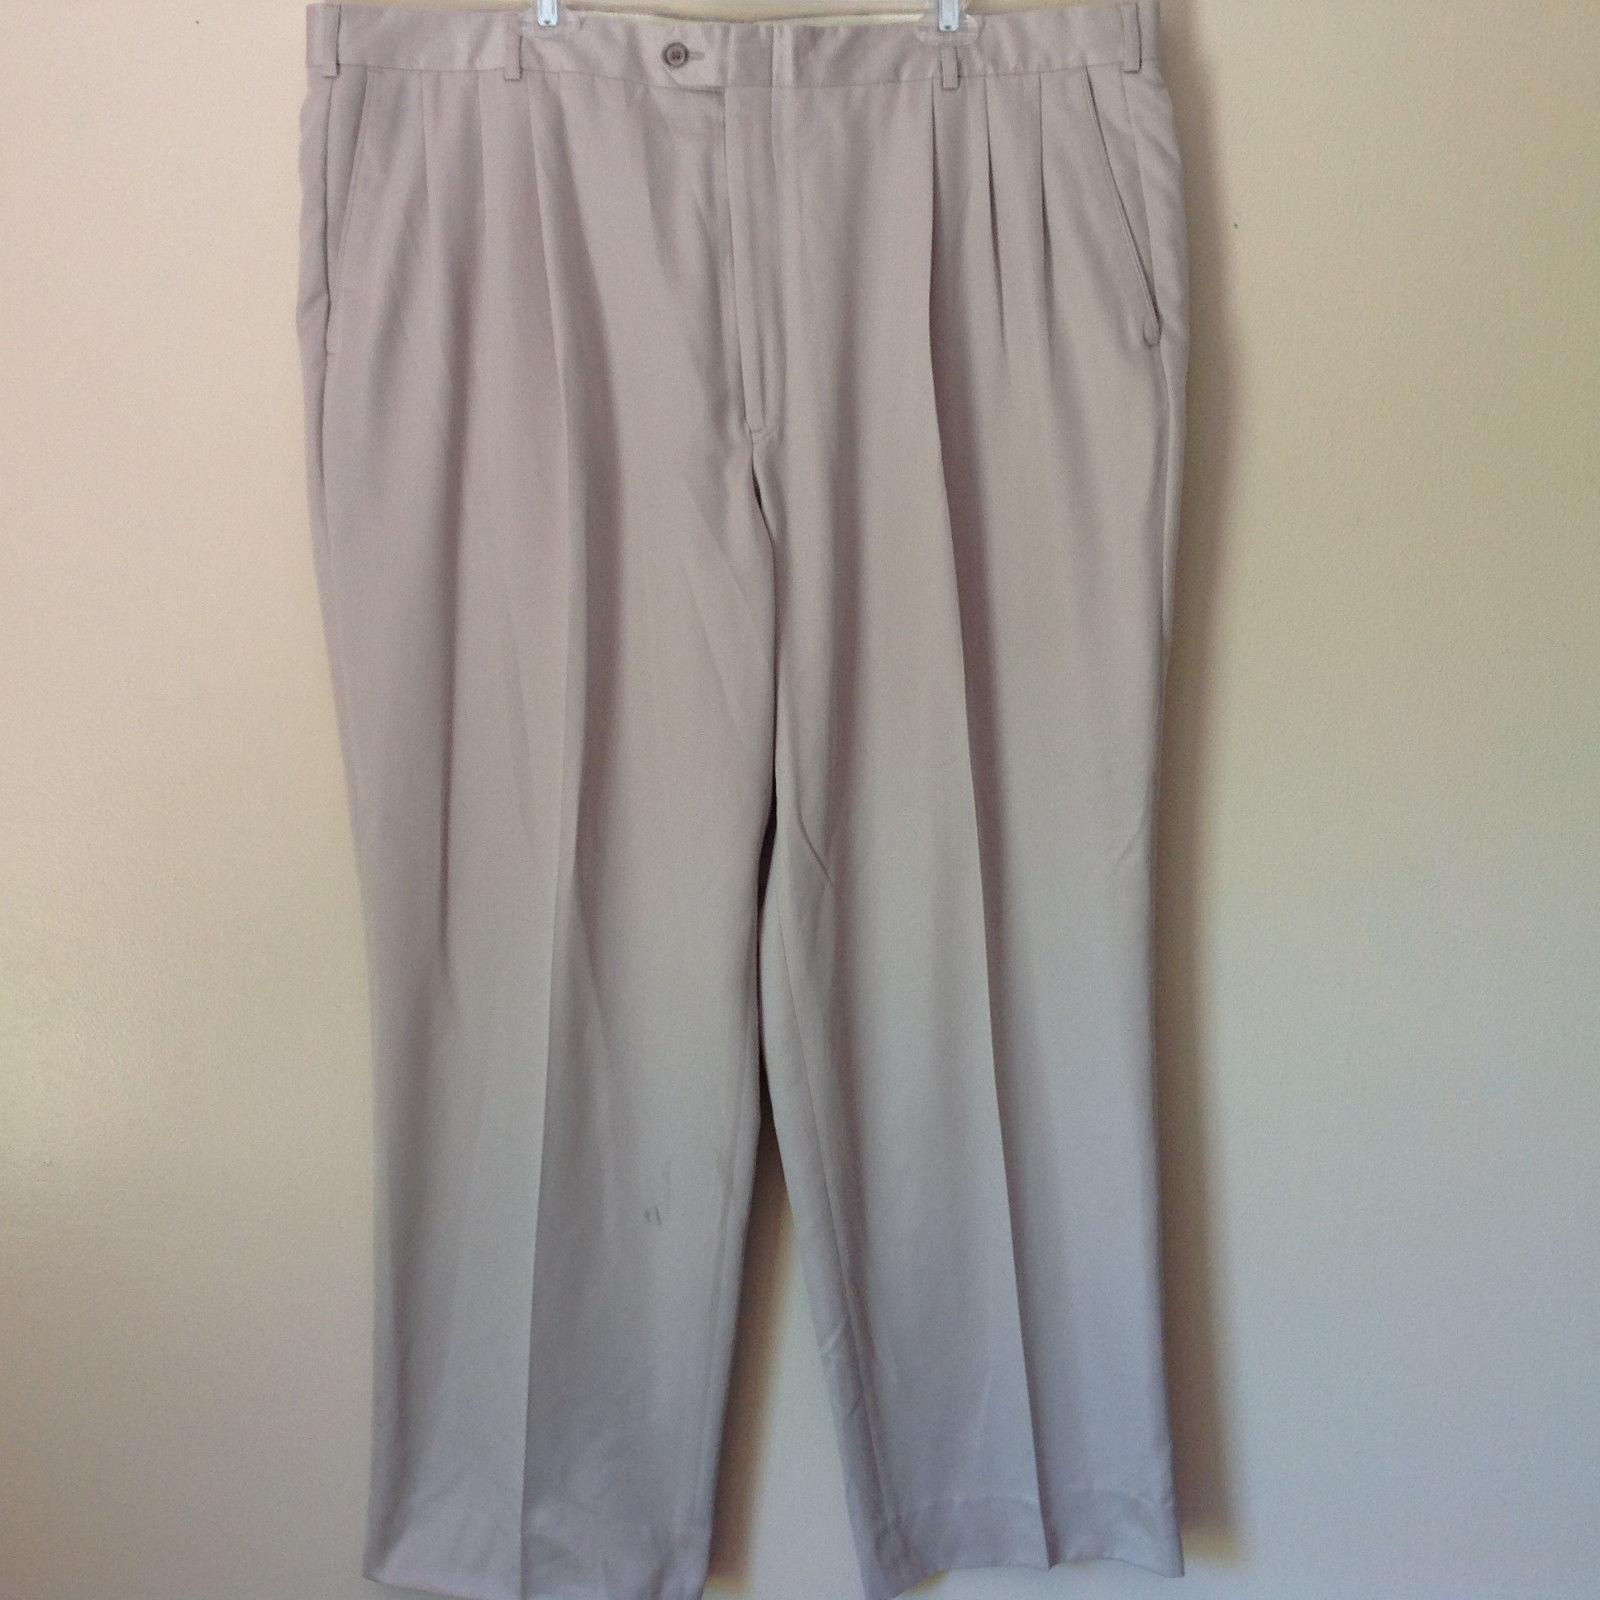 Cobra Golf Como Sport Size 44 Off White Silver Pleated Dress Pants